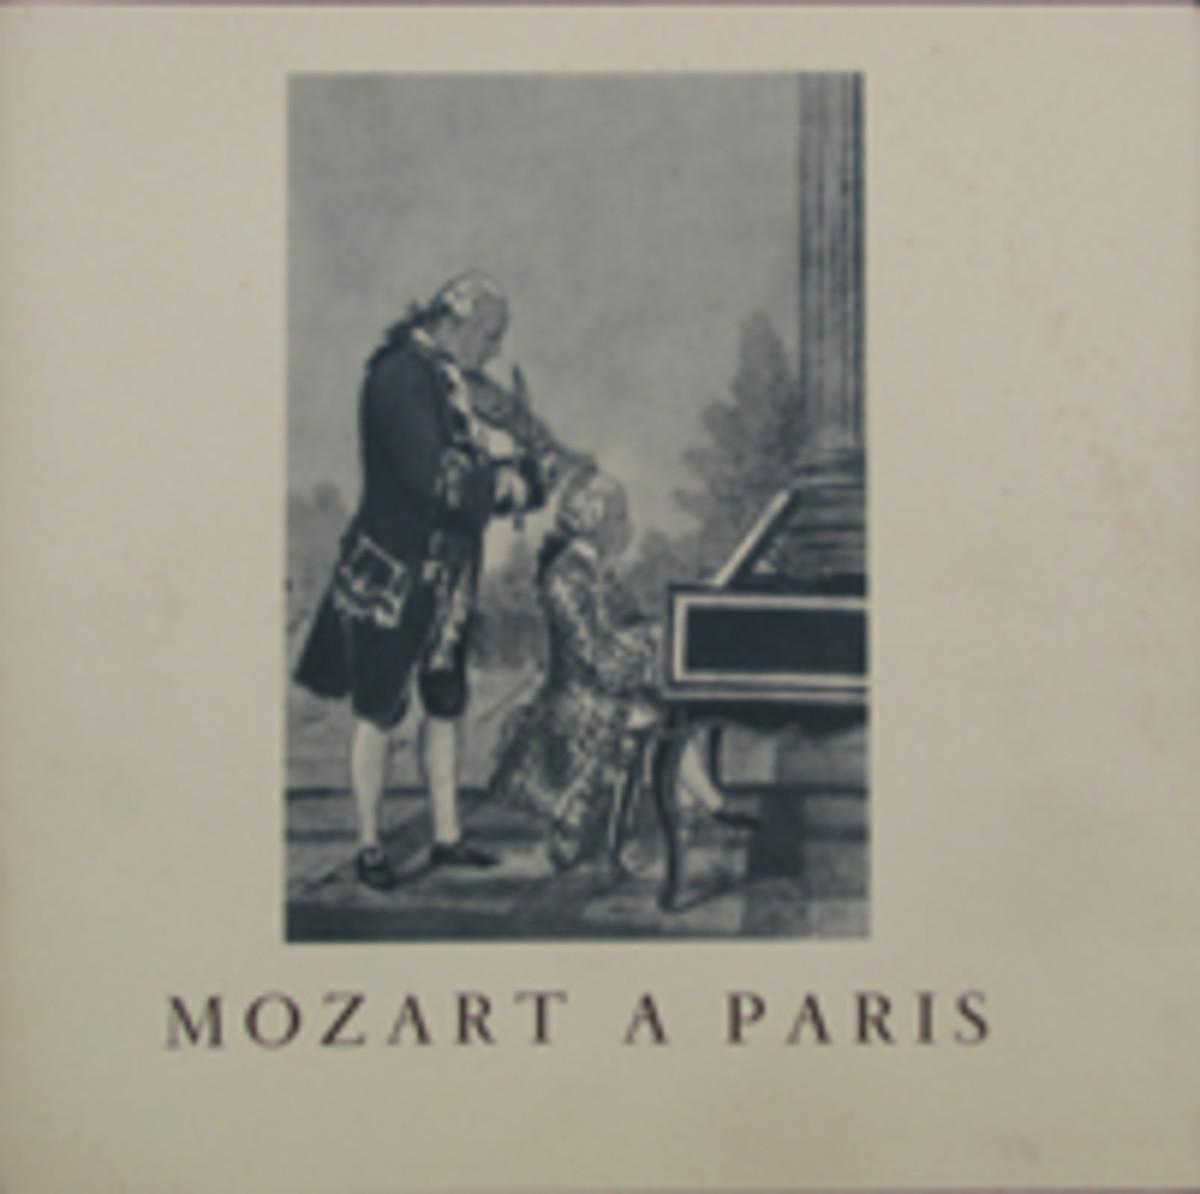 Mozart A Paris box set